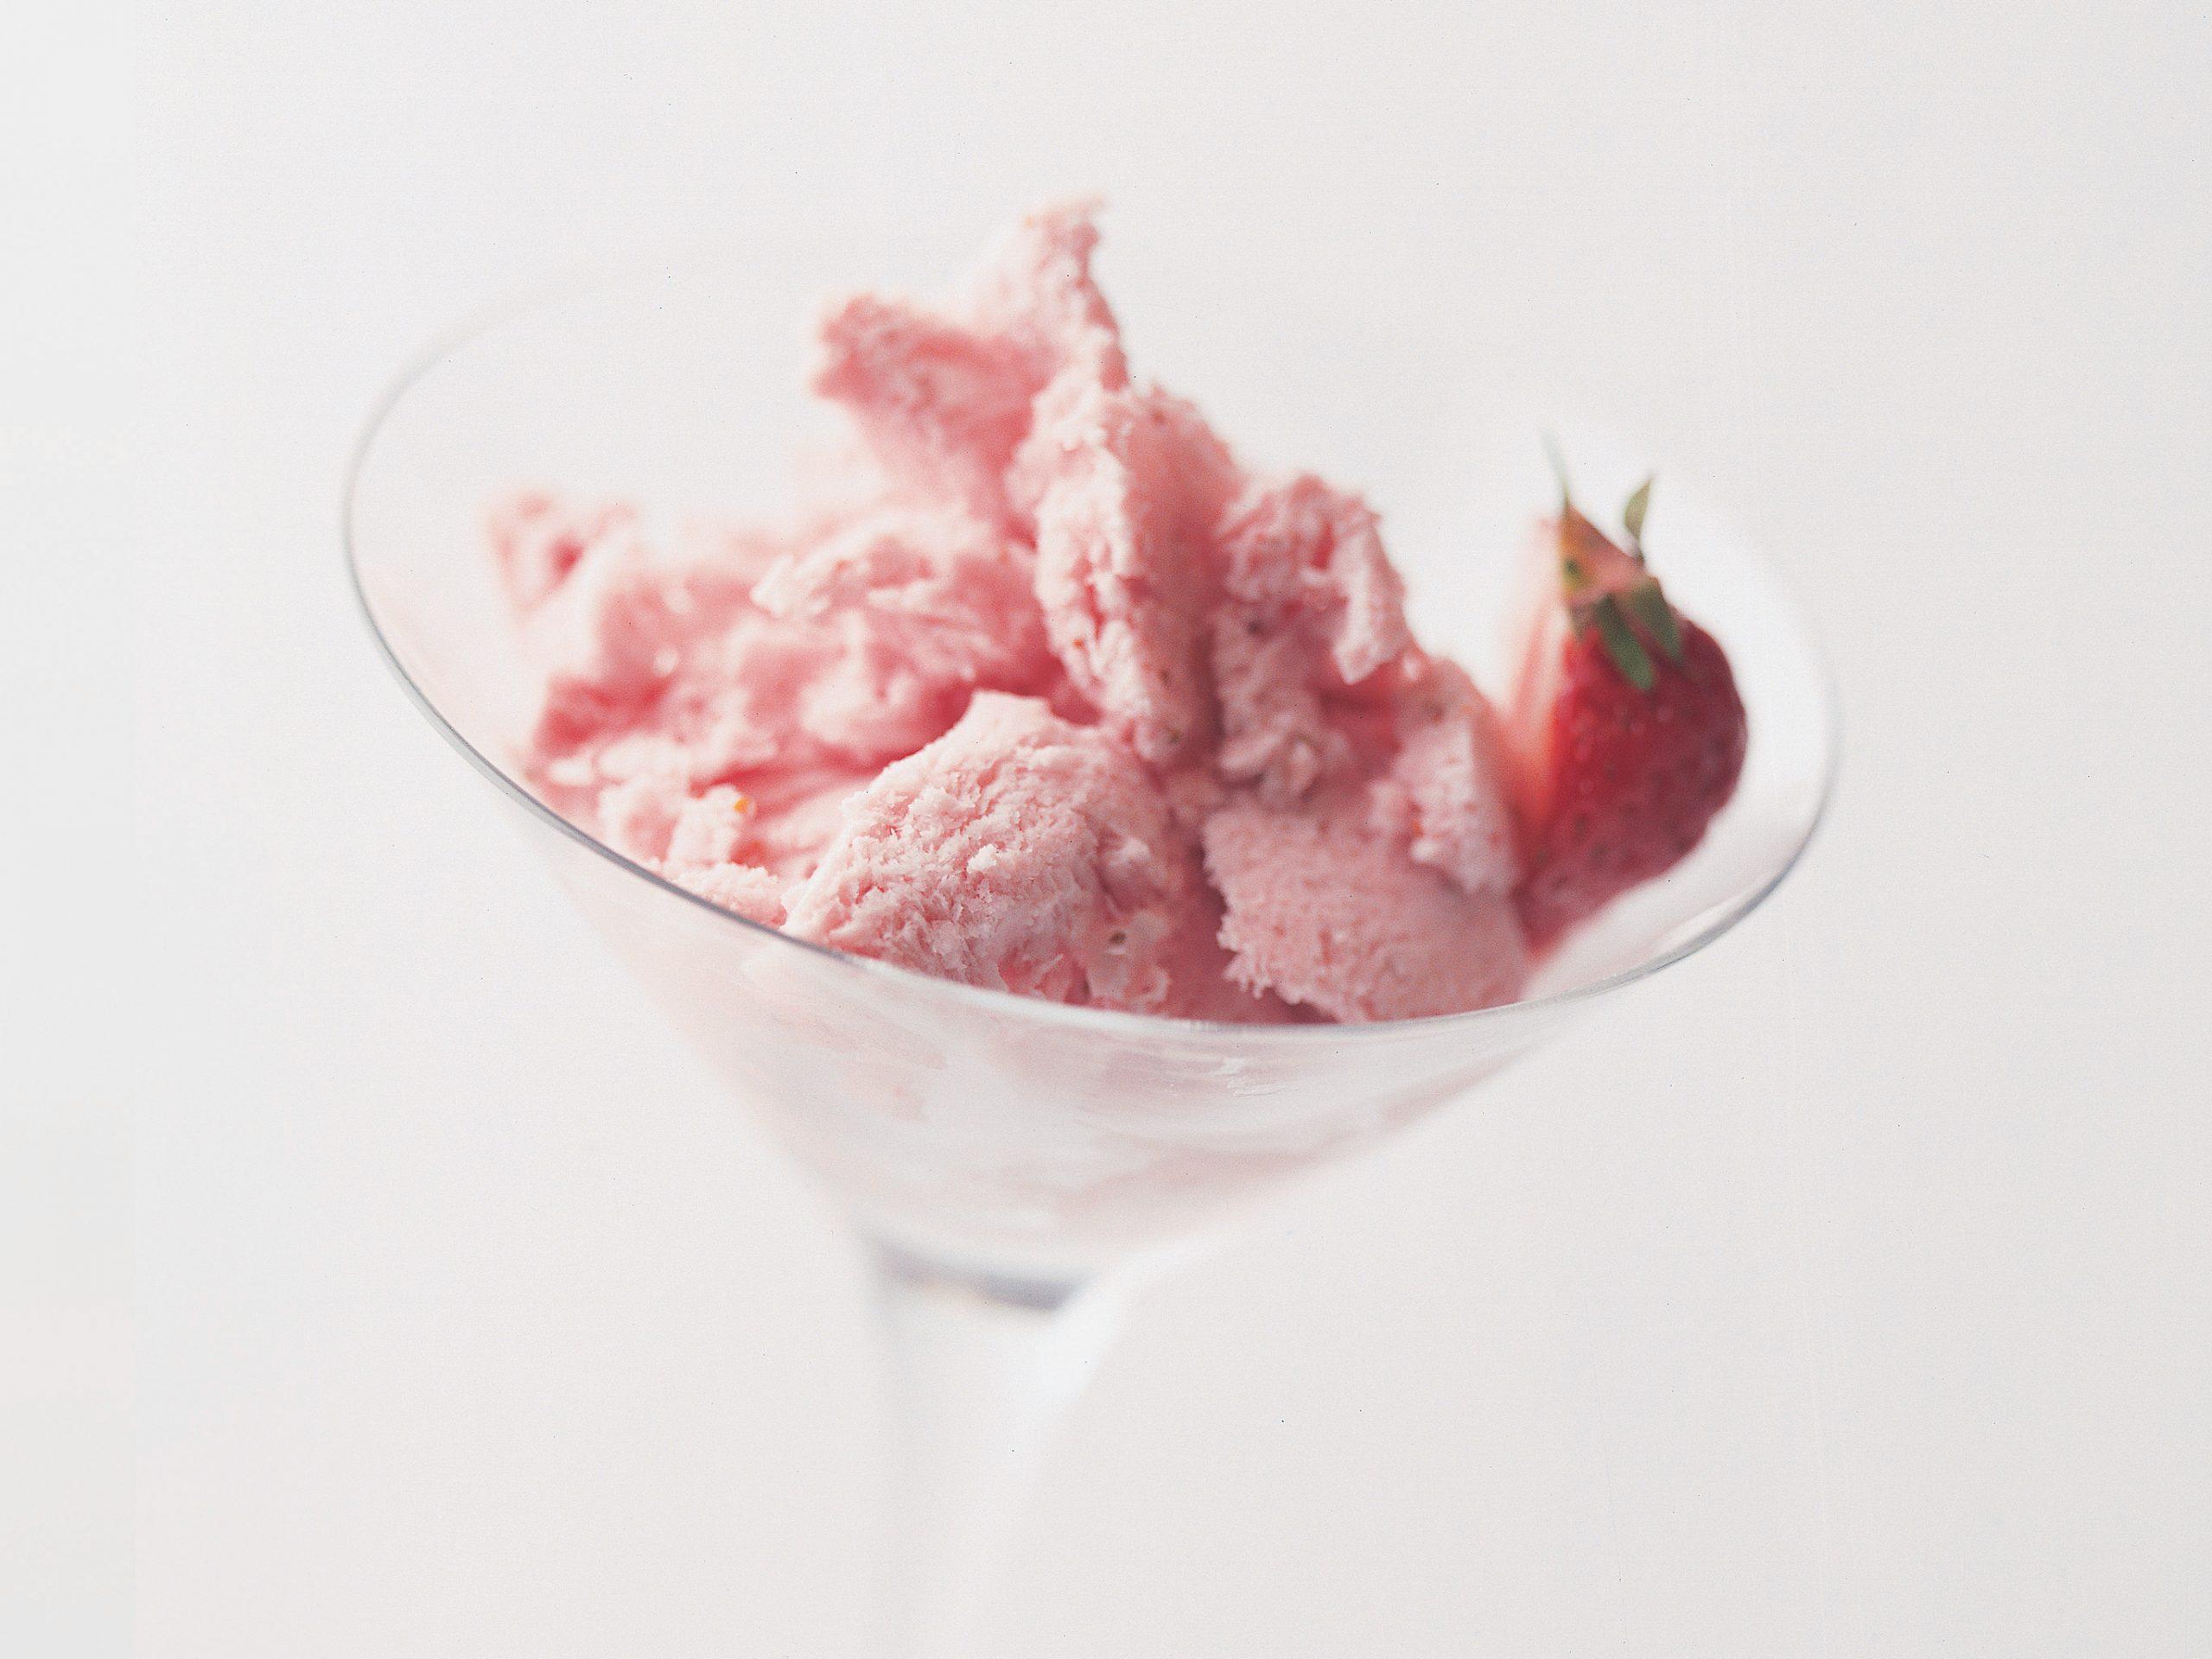 Gefrorene Erdbeermousse